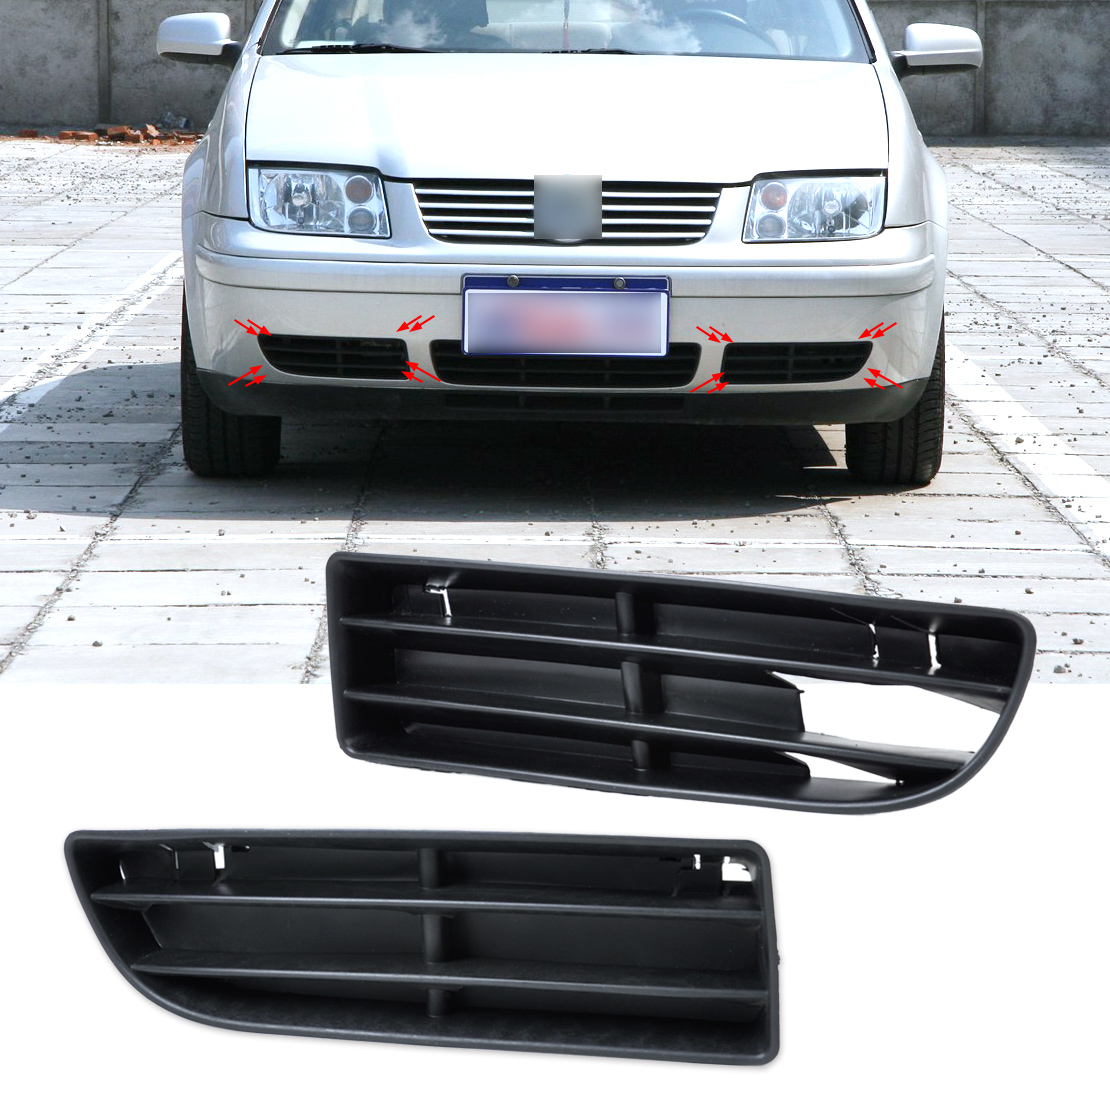 Dwcx 1j5853665b 1j5853666c front lower grille bumper vent for volkswagen vw jetta bora mk4 1999